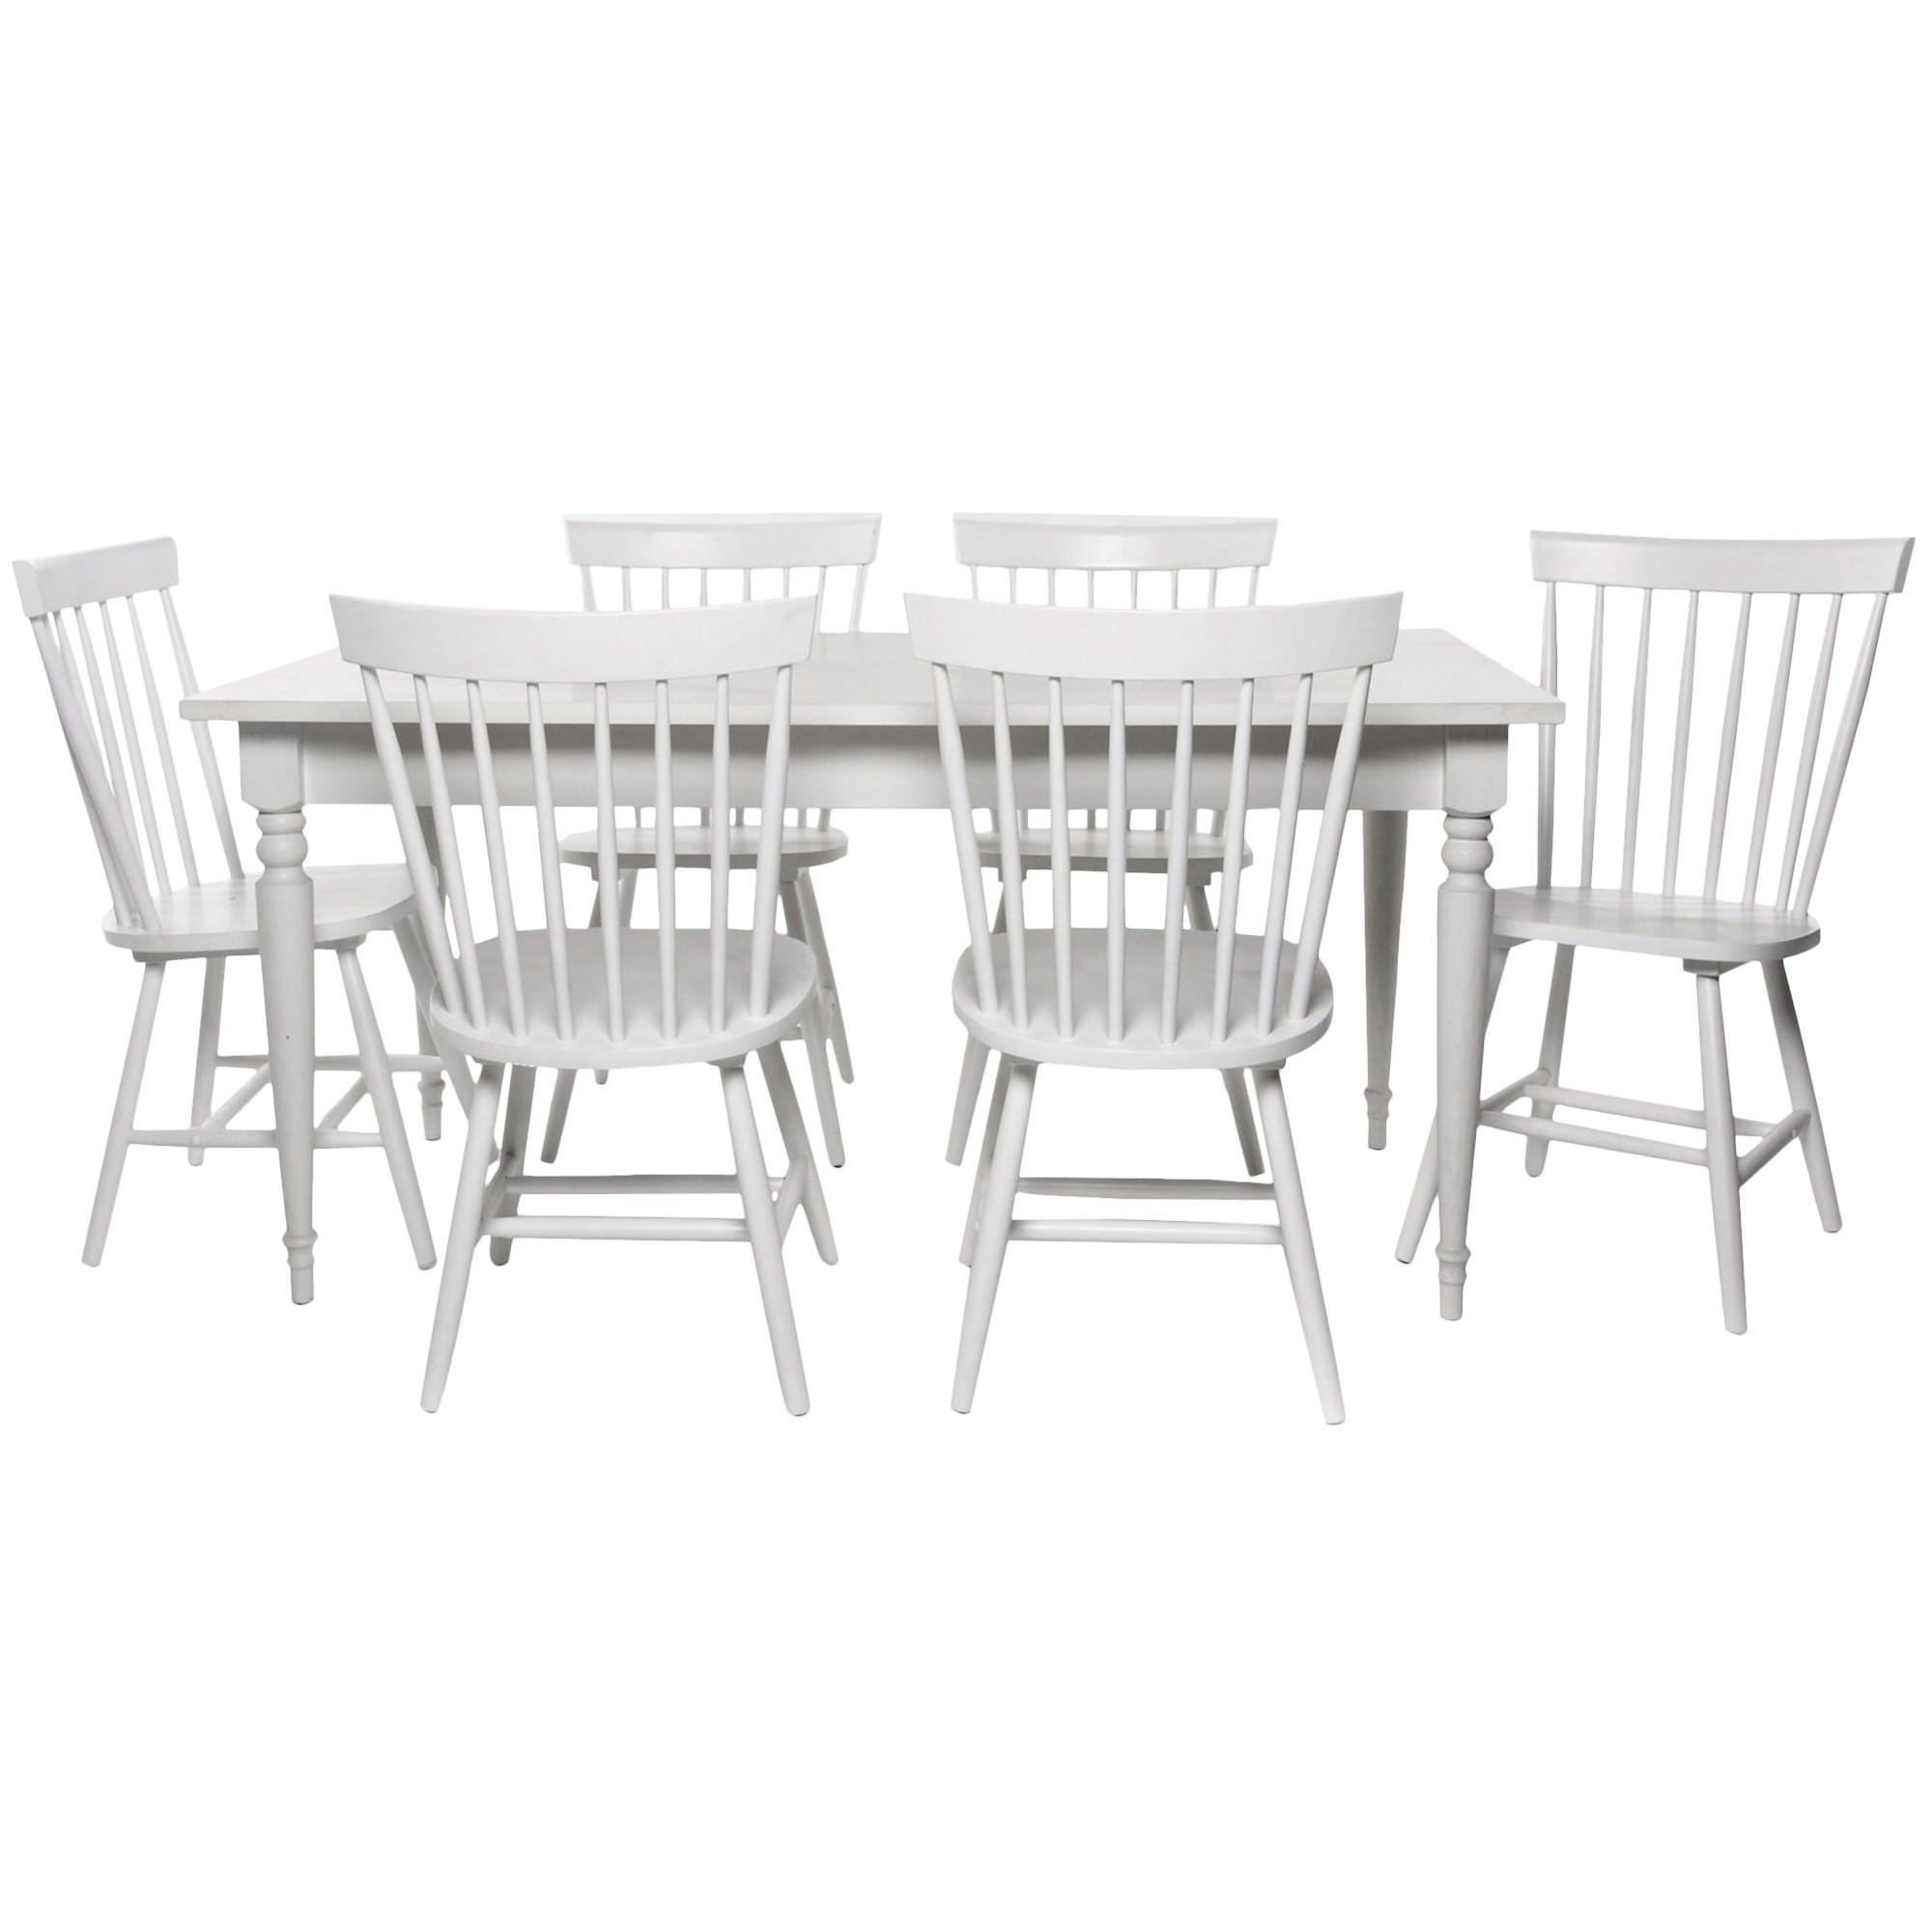 Washington 7 Piece Rubber Wood Dining Table Set, 200cm